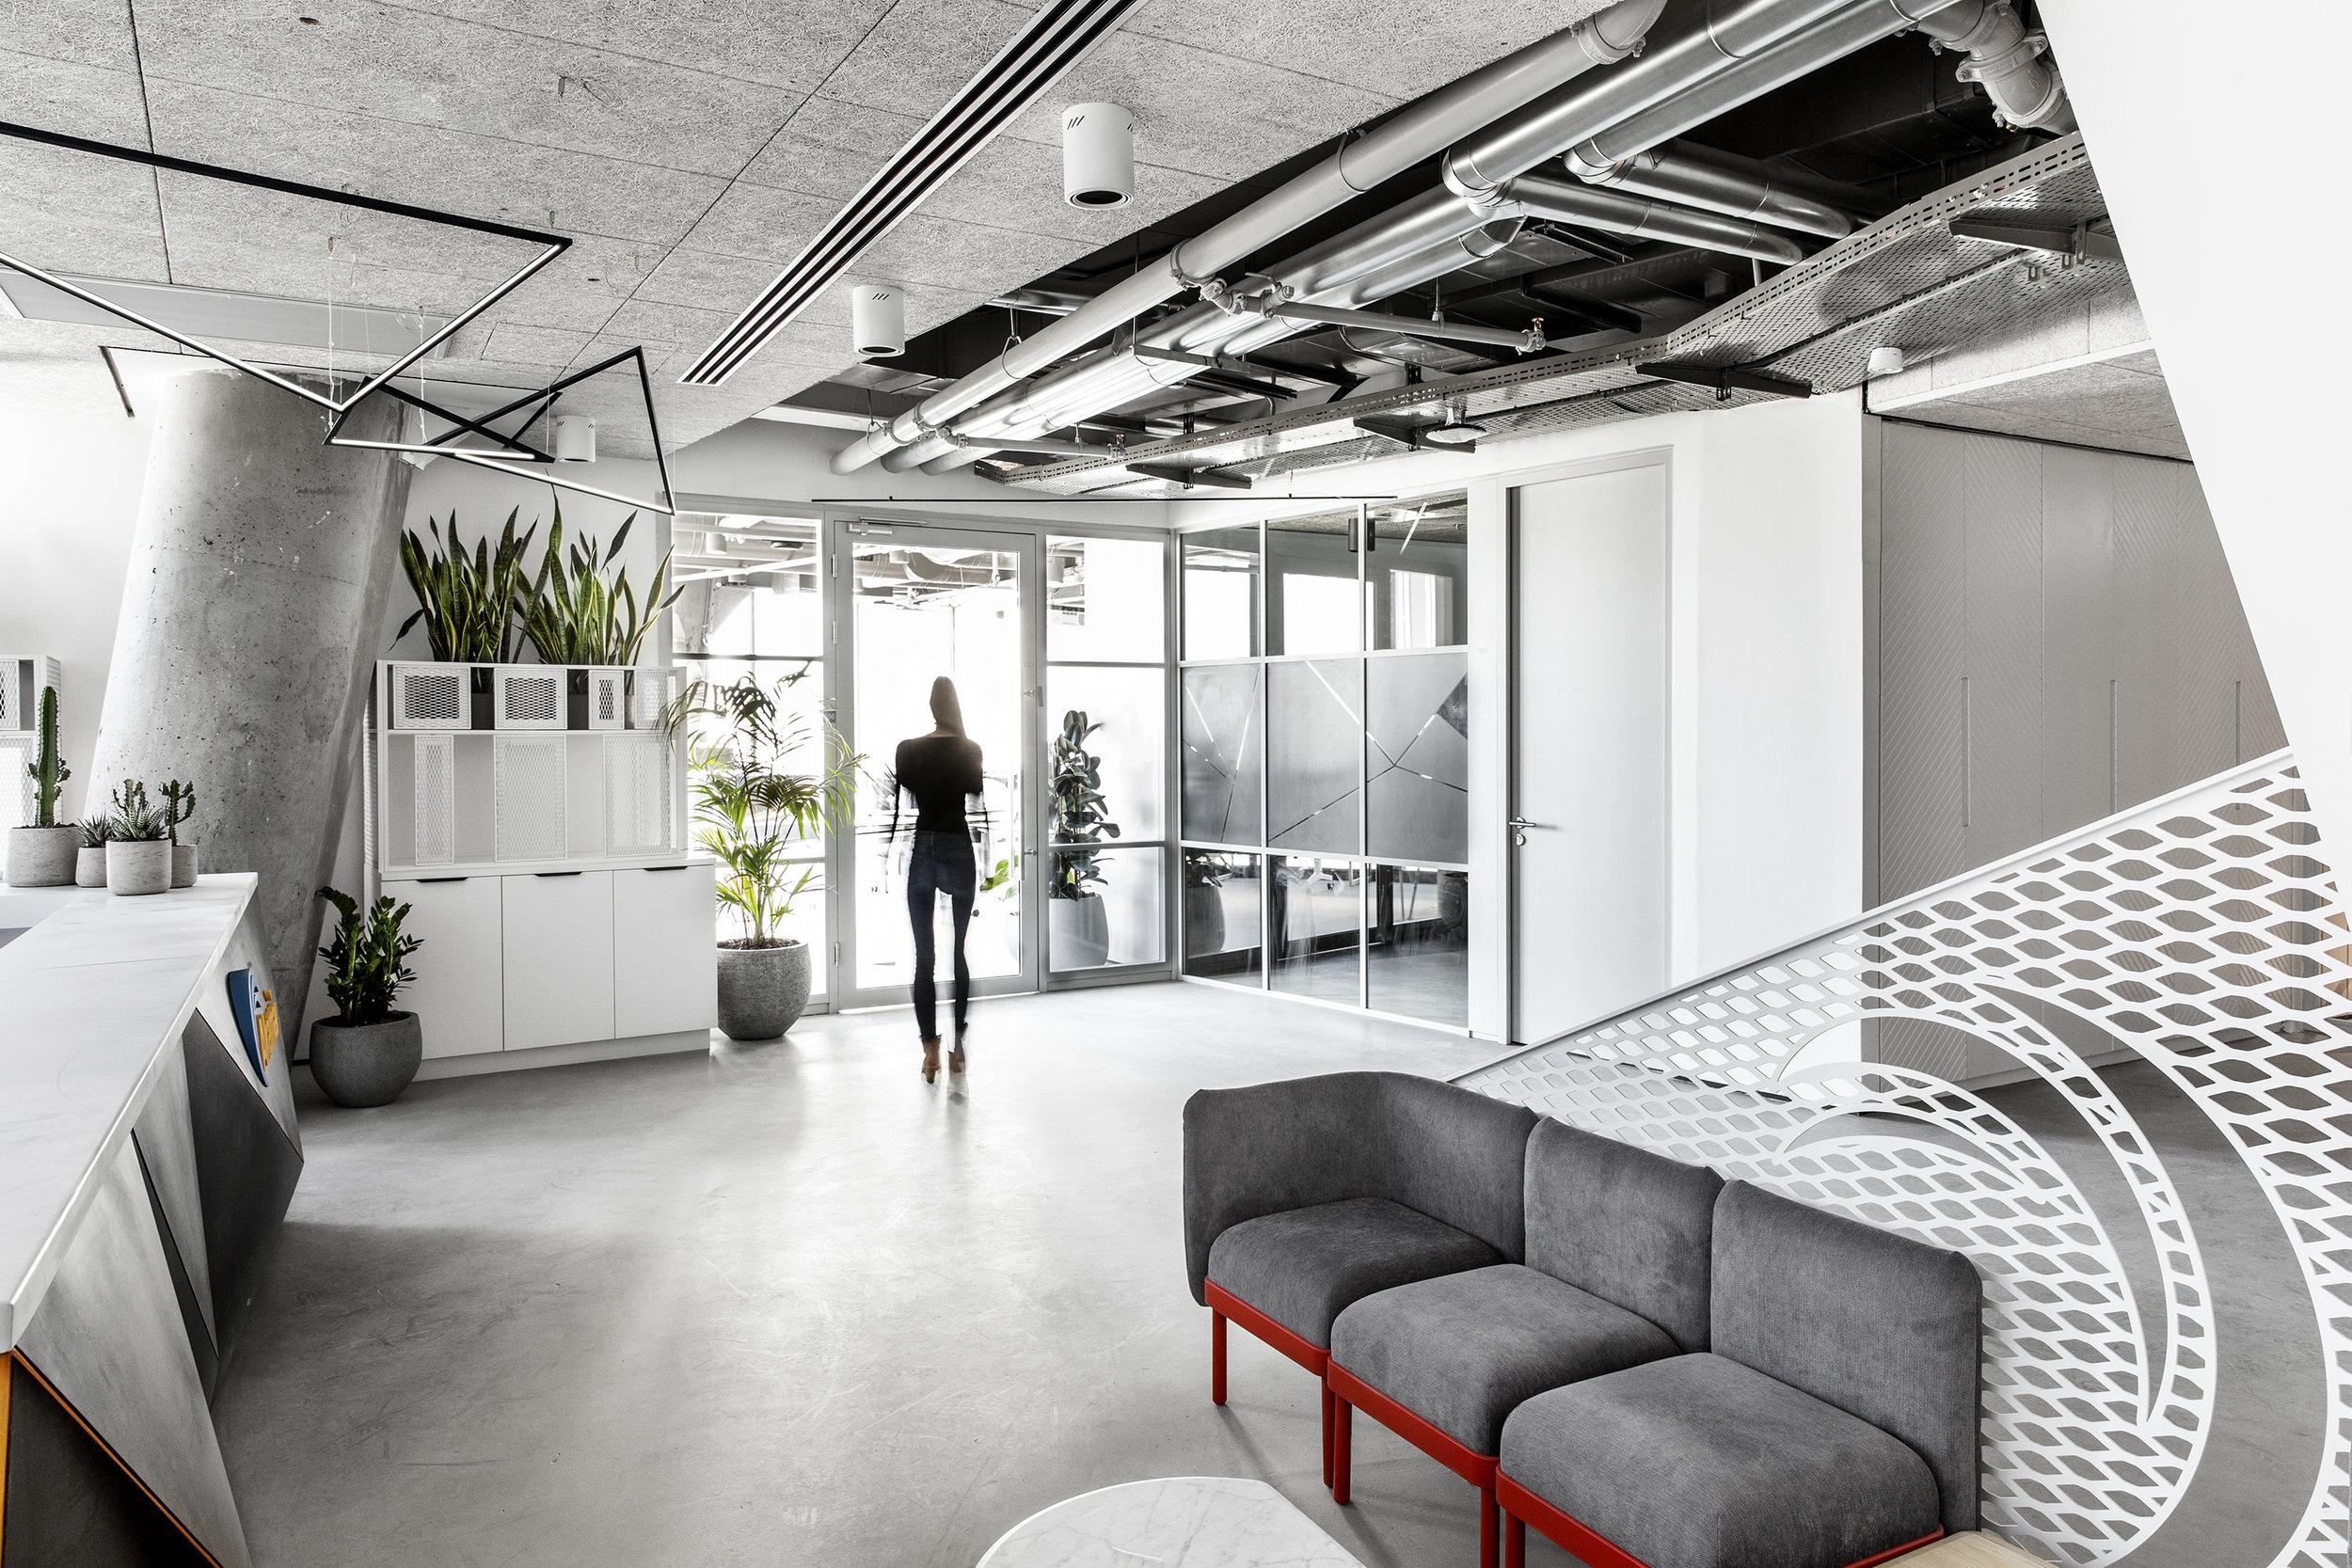 AKAMAI - ROY DAVID ARCHITECTURE - STUDIO - רואי דוד אדריכלות - אדריכלים - סטודיו - אקמאי (3).jpg